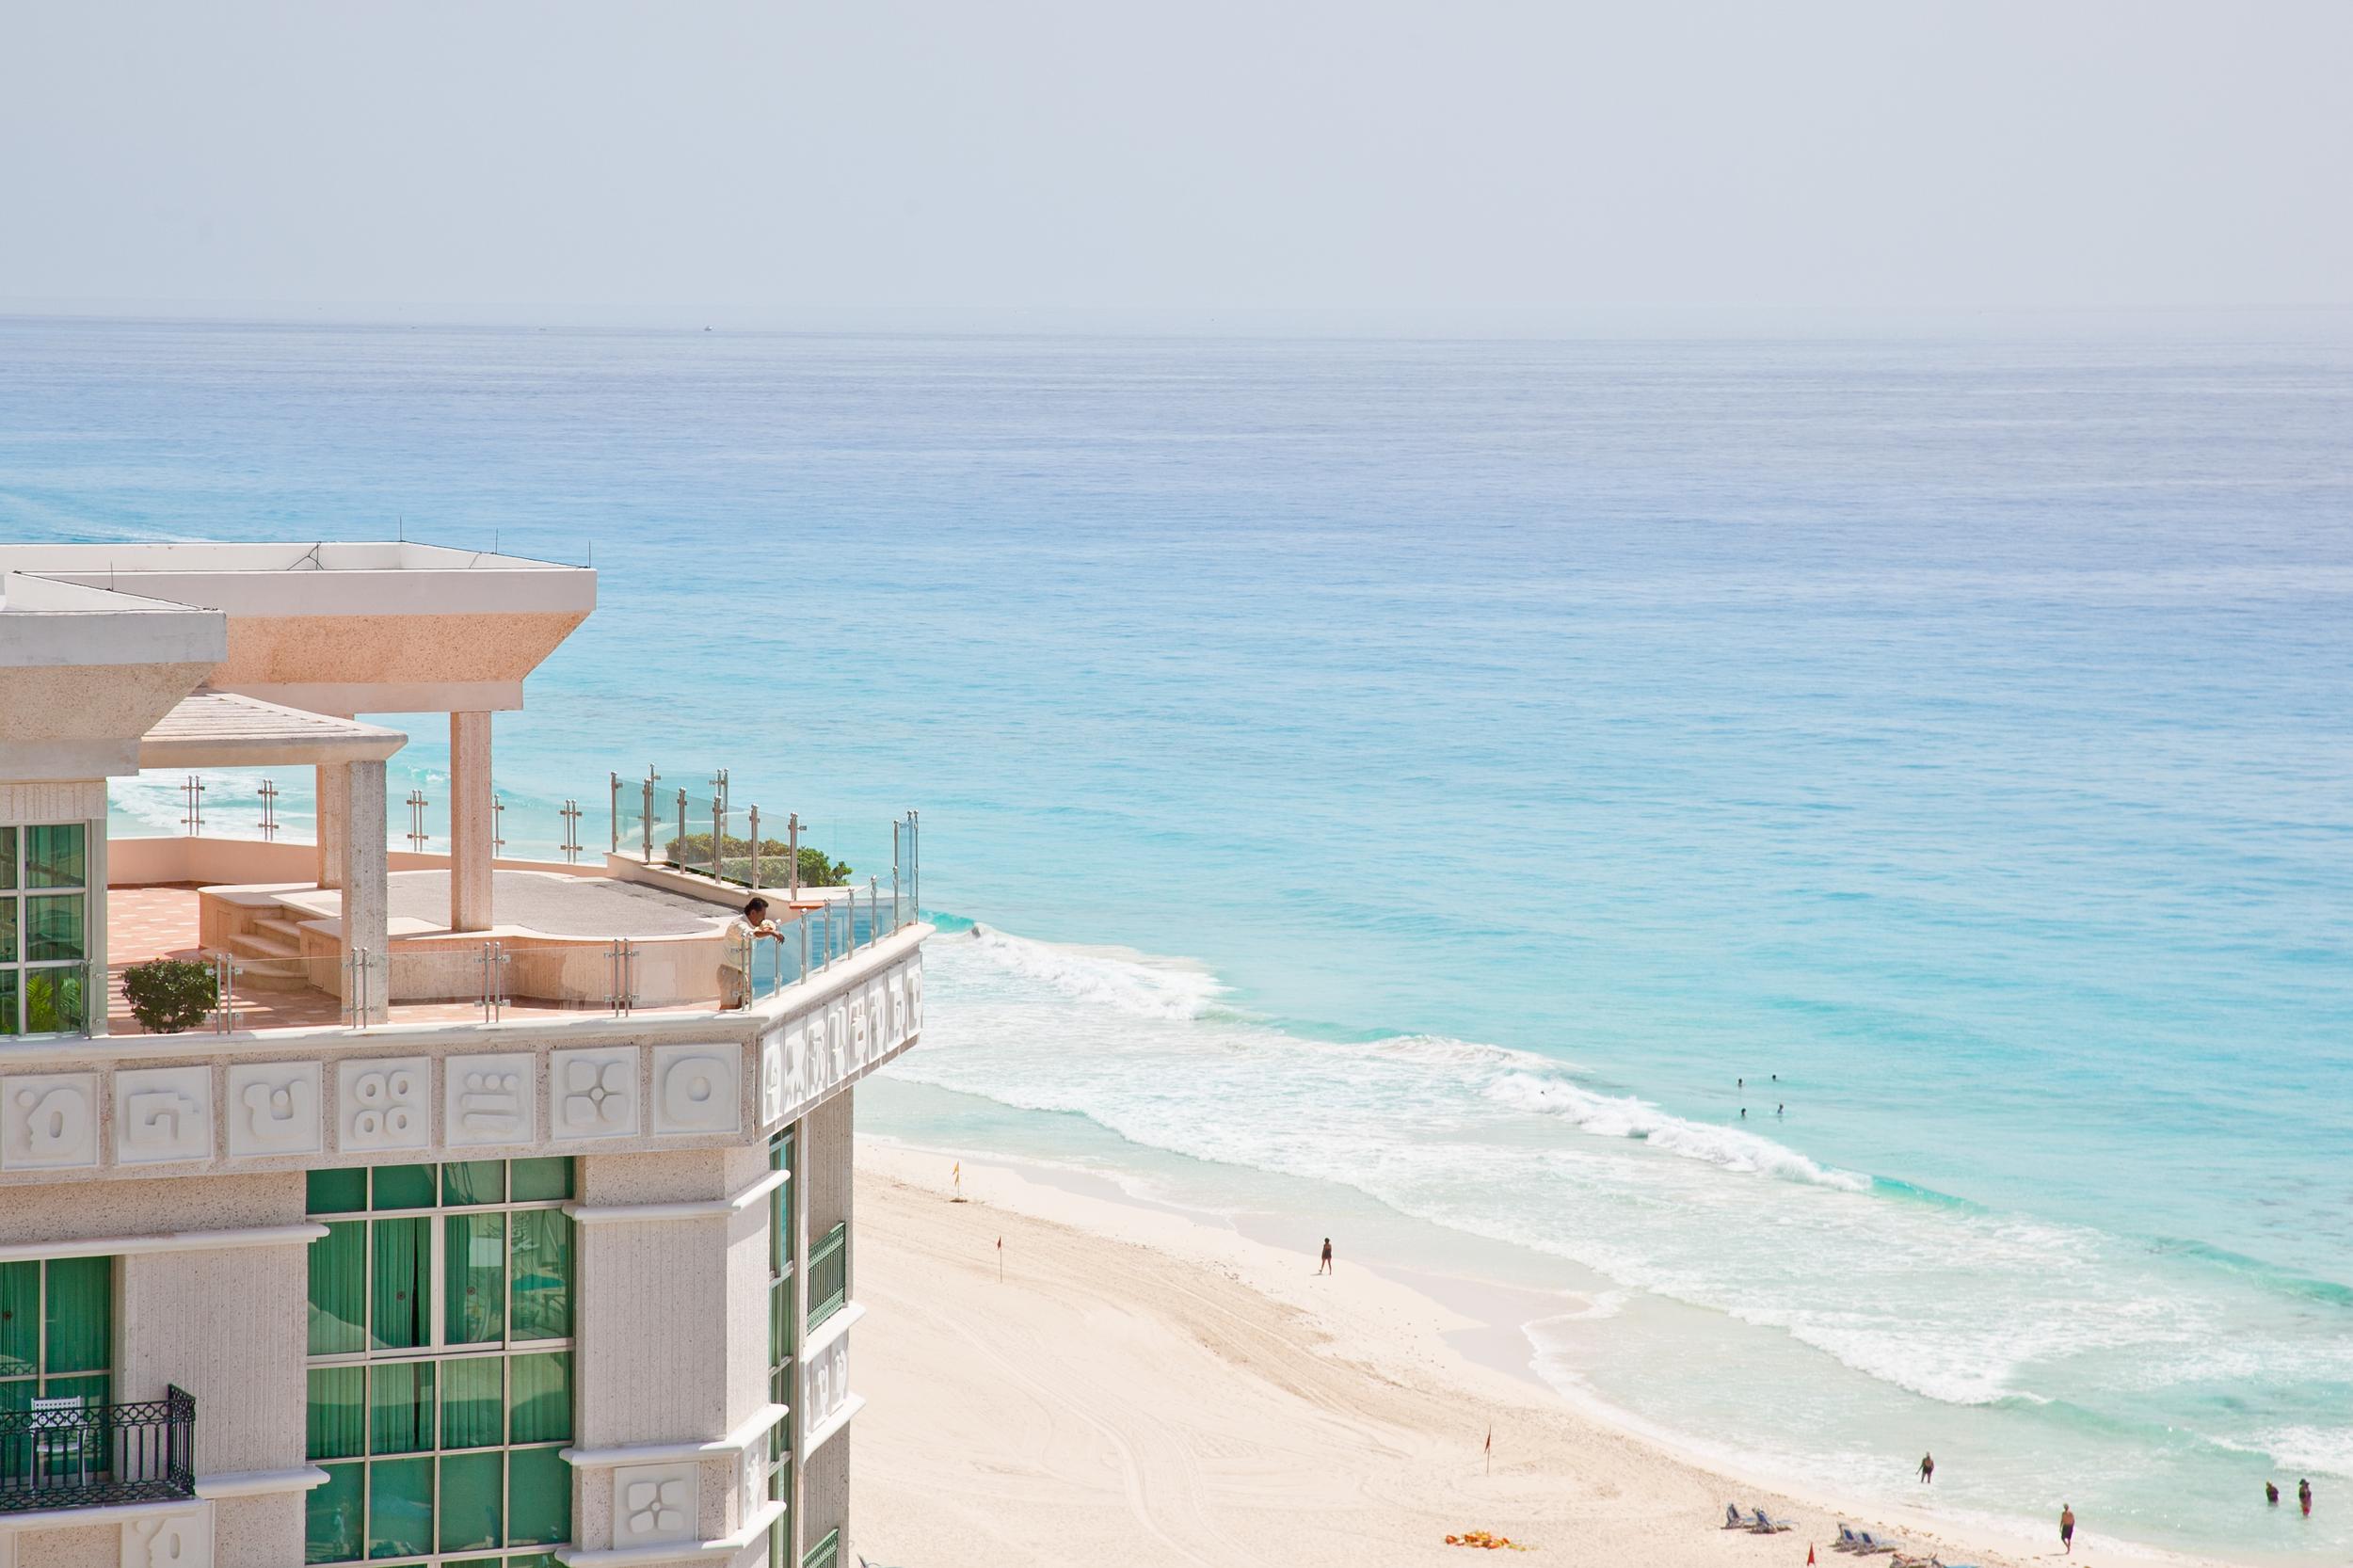 trisa-taro-hotel-view-beach-cancun.jpg